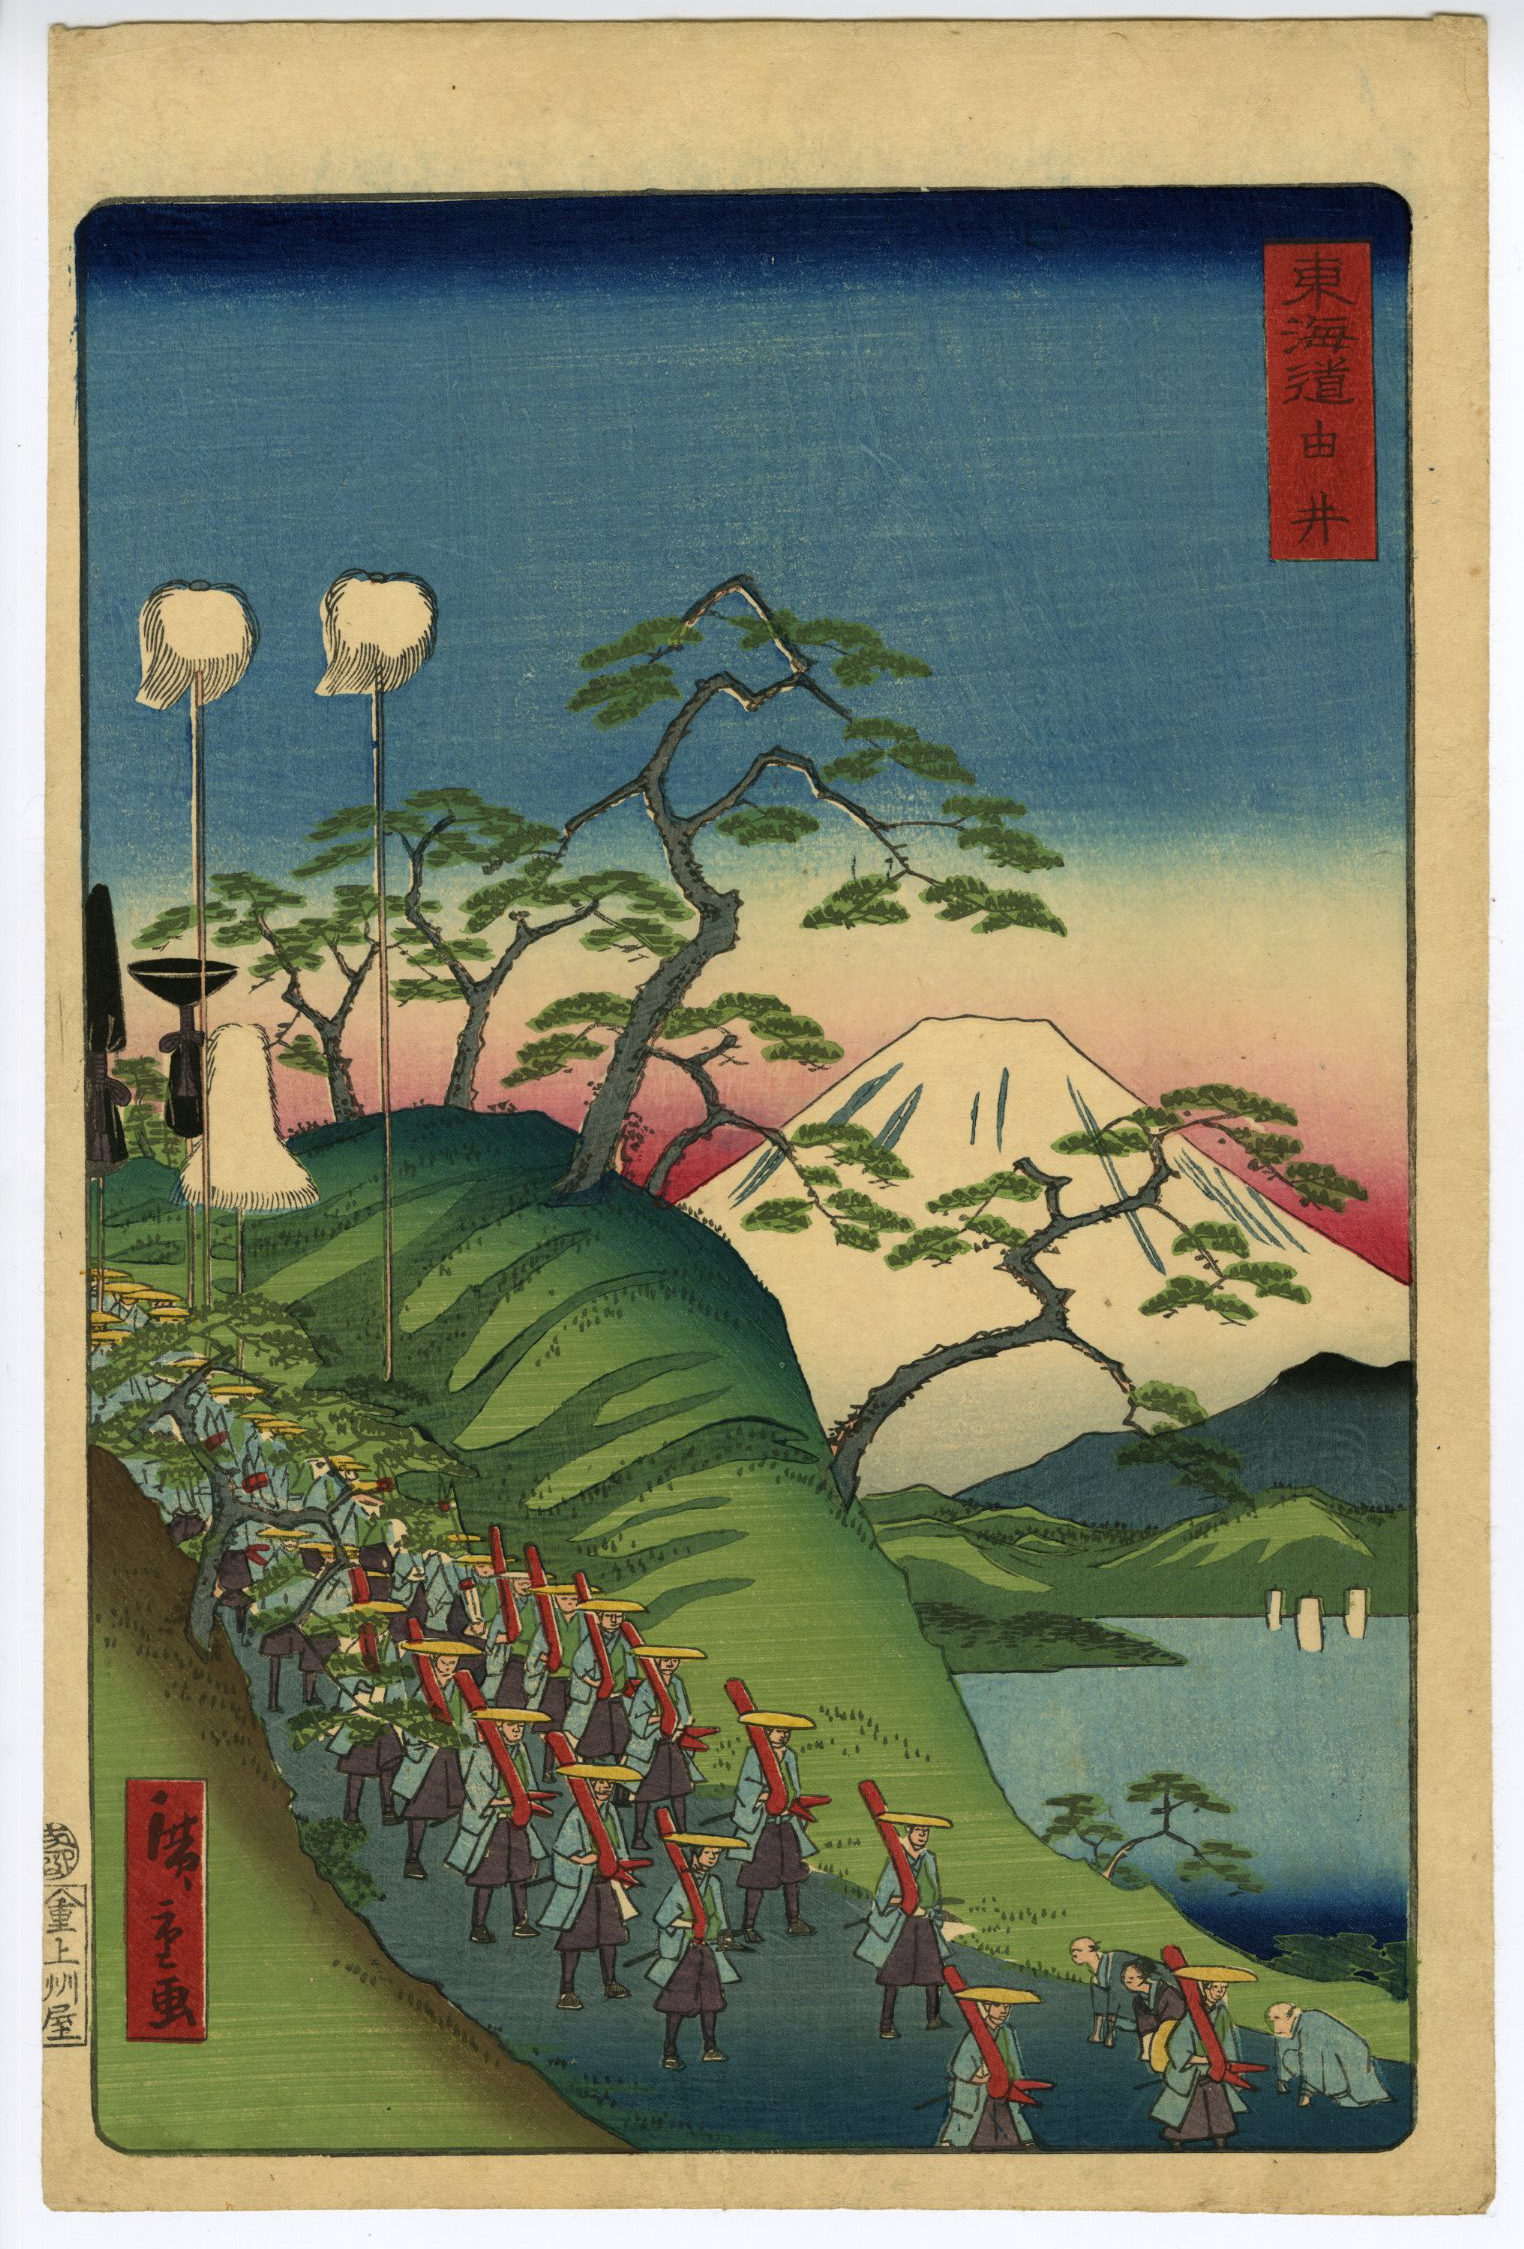 YUI_広重Ⅱ(ひろしげⅡ) - 東海道 由井 - 浮世絵販売 - 浮世絵ぎゃら ...